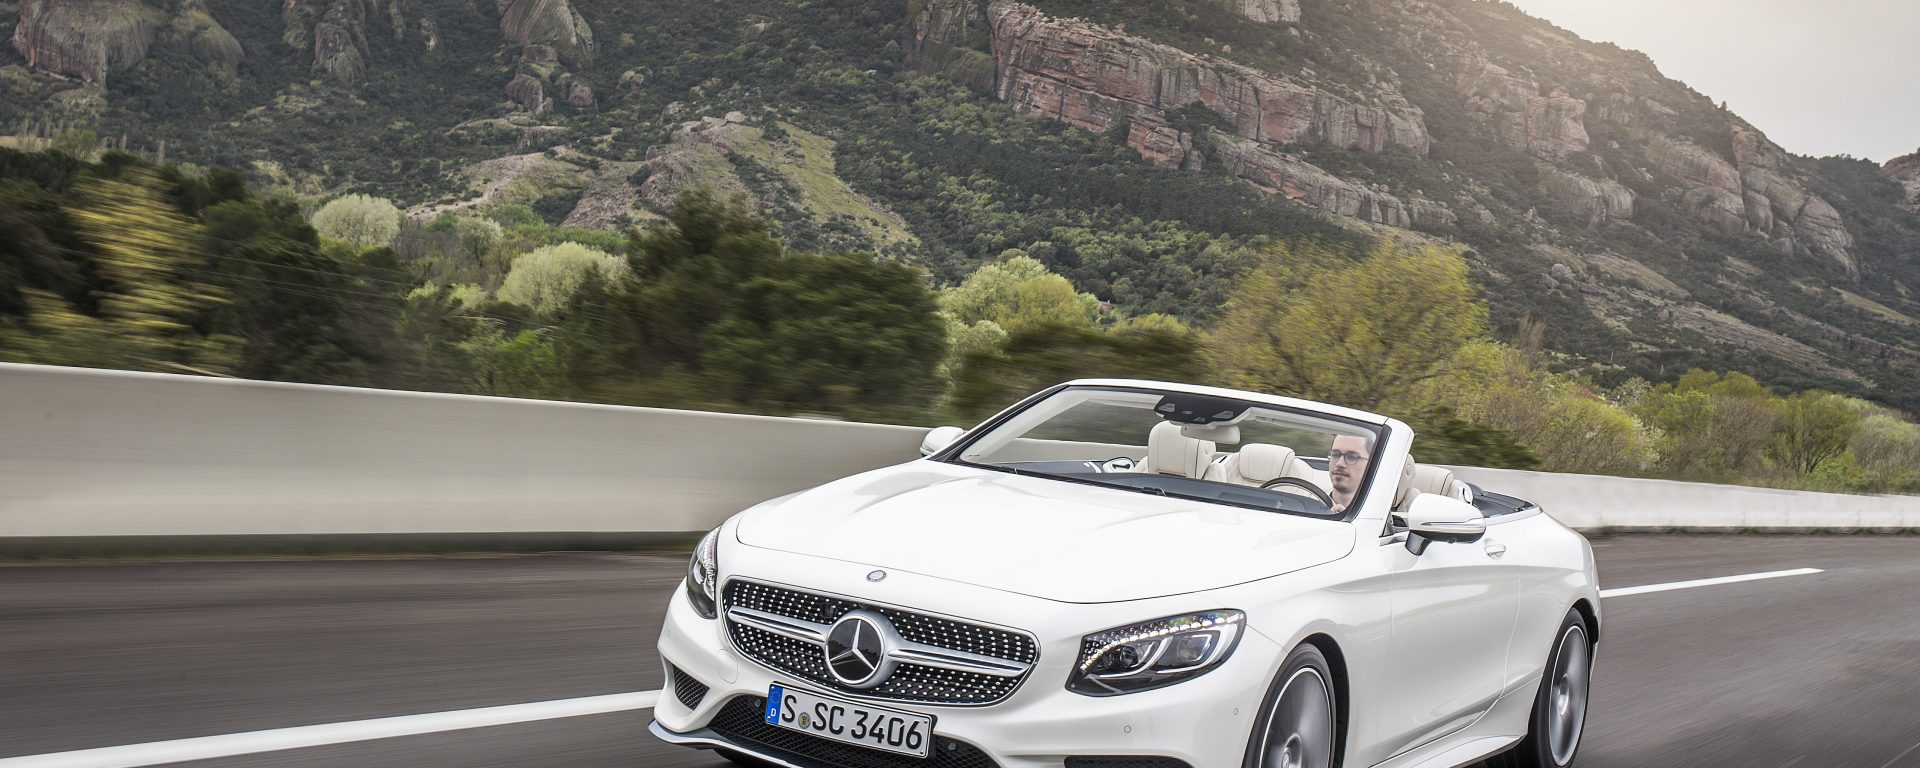 Mercedes Benz S 500 Cabriolet, diamantweiss-mettalic, Leder: designo beige ;Kraftstoffverbrauch kombiniert:  8,5 (l/100 km), CO2-Emissionen kombiniert: 199 (g/km)  Mercedes Benz S 500 Cabriolet, designo diamond white bright, Leather: designo exclusive nappa porcelain / deep-sea blue; Fuel consumption, combined:   8.5 (l/100 km), CO2 emissions, combined:  199 (g/km)